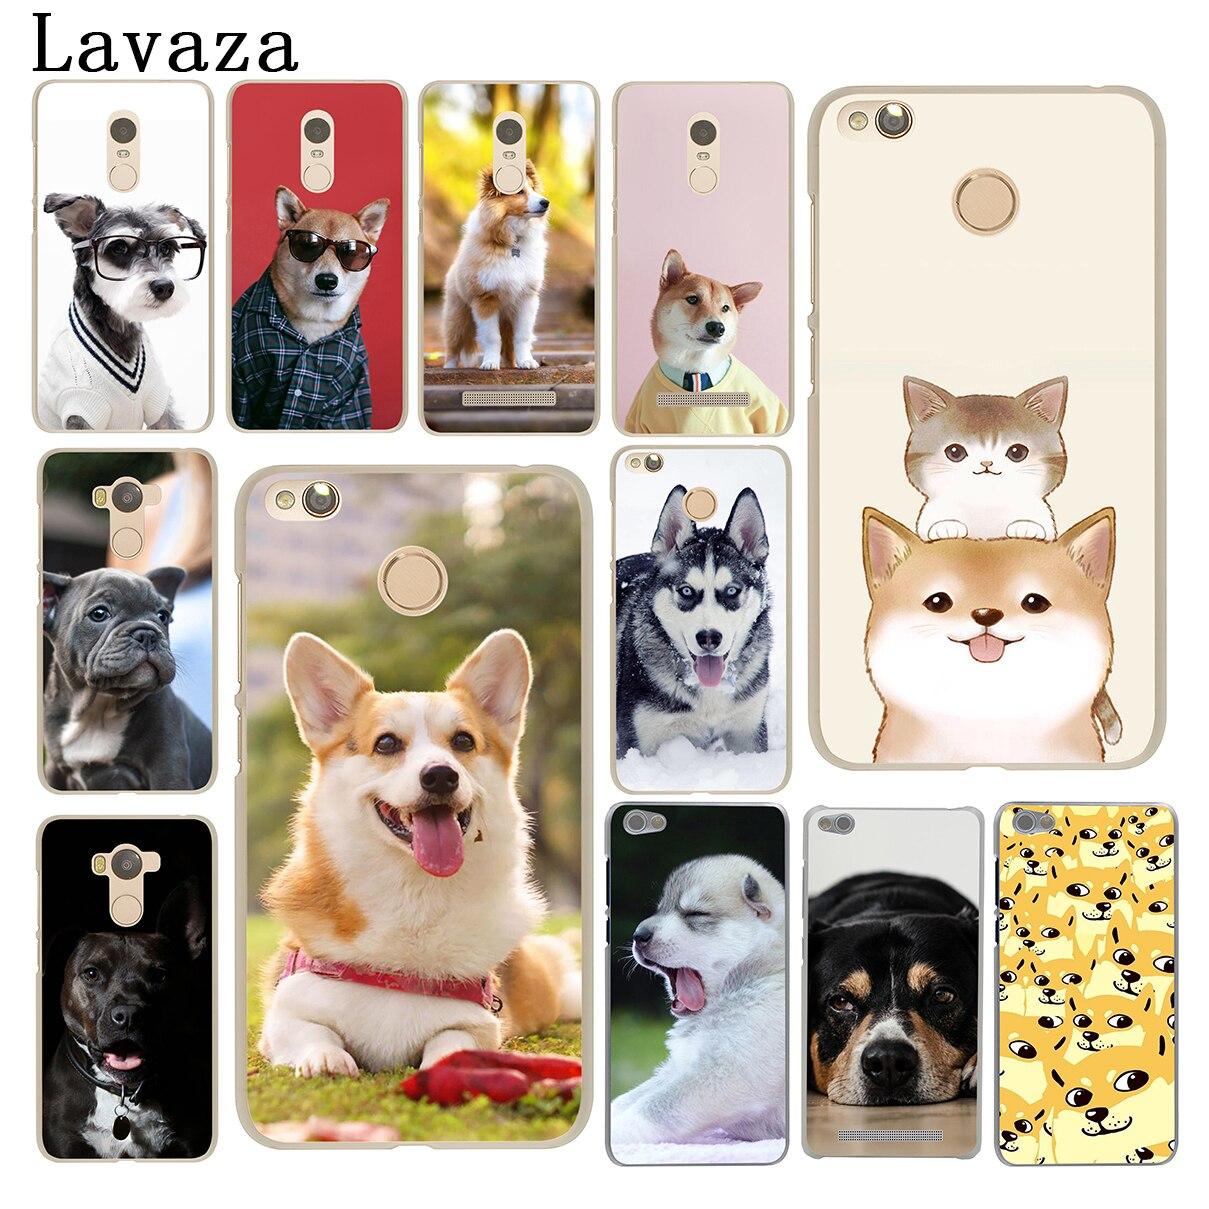 Lavaza Cute French Bulldog corgi Golden Retriever Dog Case for Xiaomi Redmi 4X Mi A1 6 5 5X 5S Plus Note 5A 2 3 3S 4A 4 4X Pro